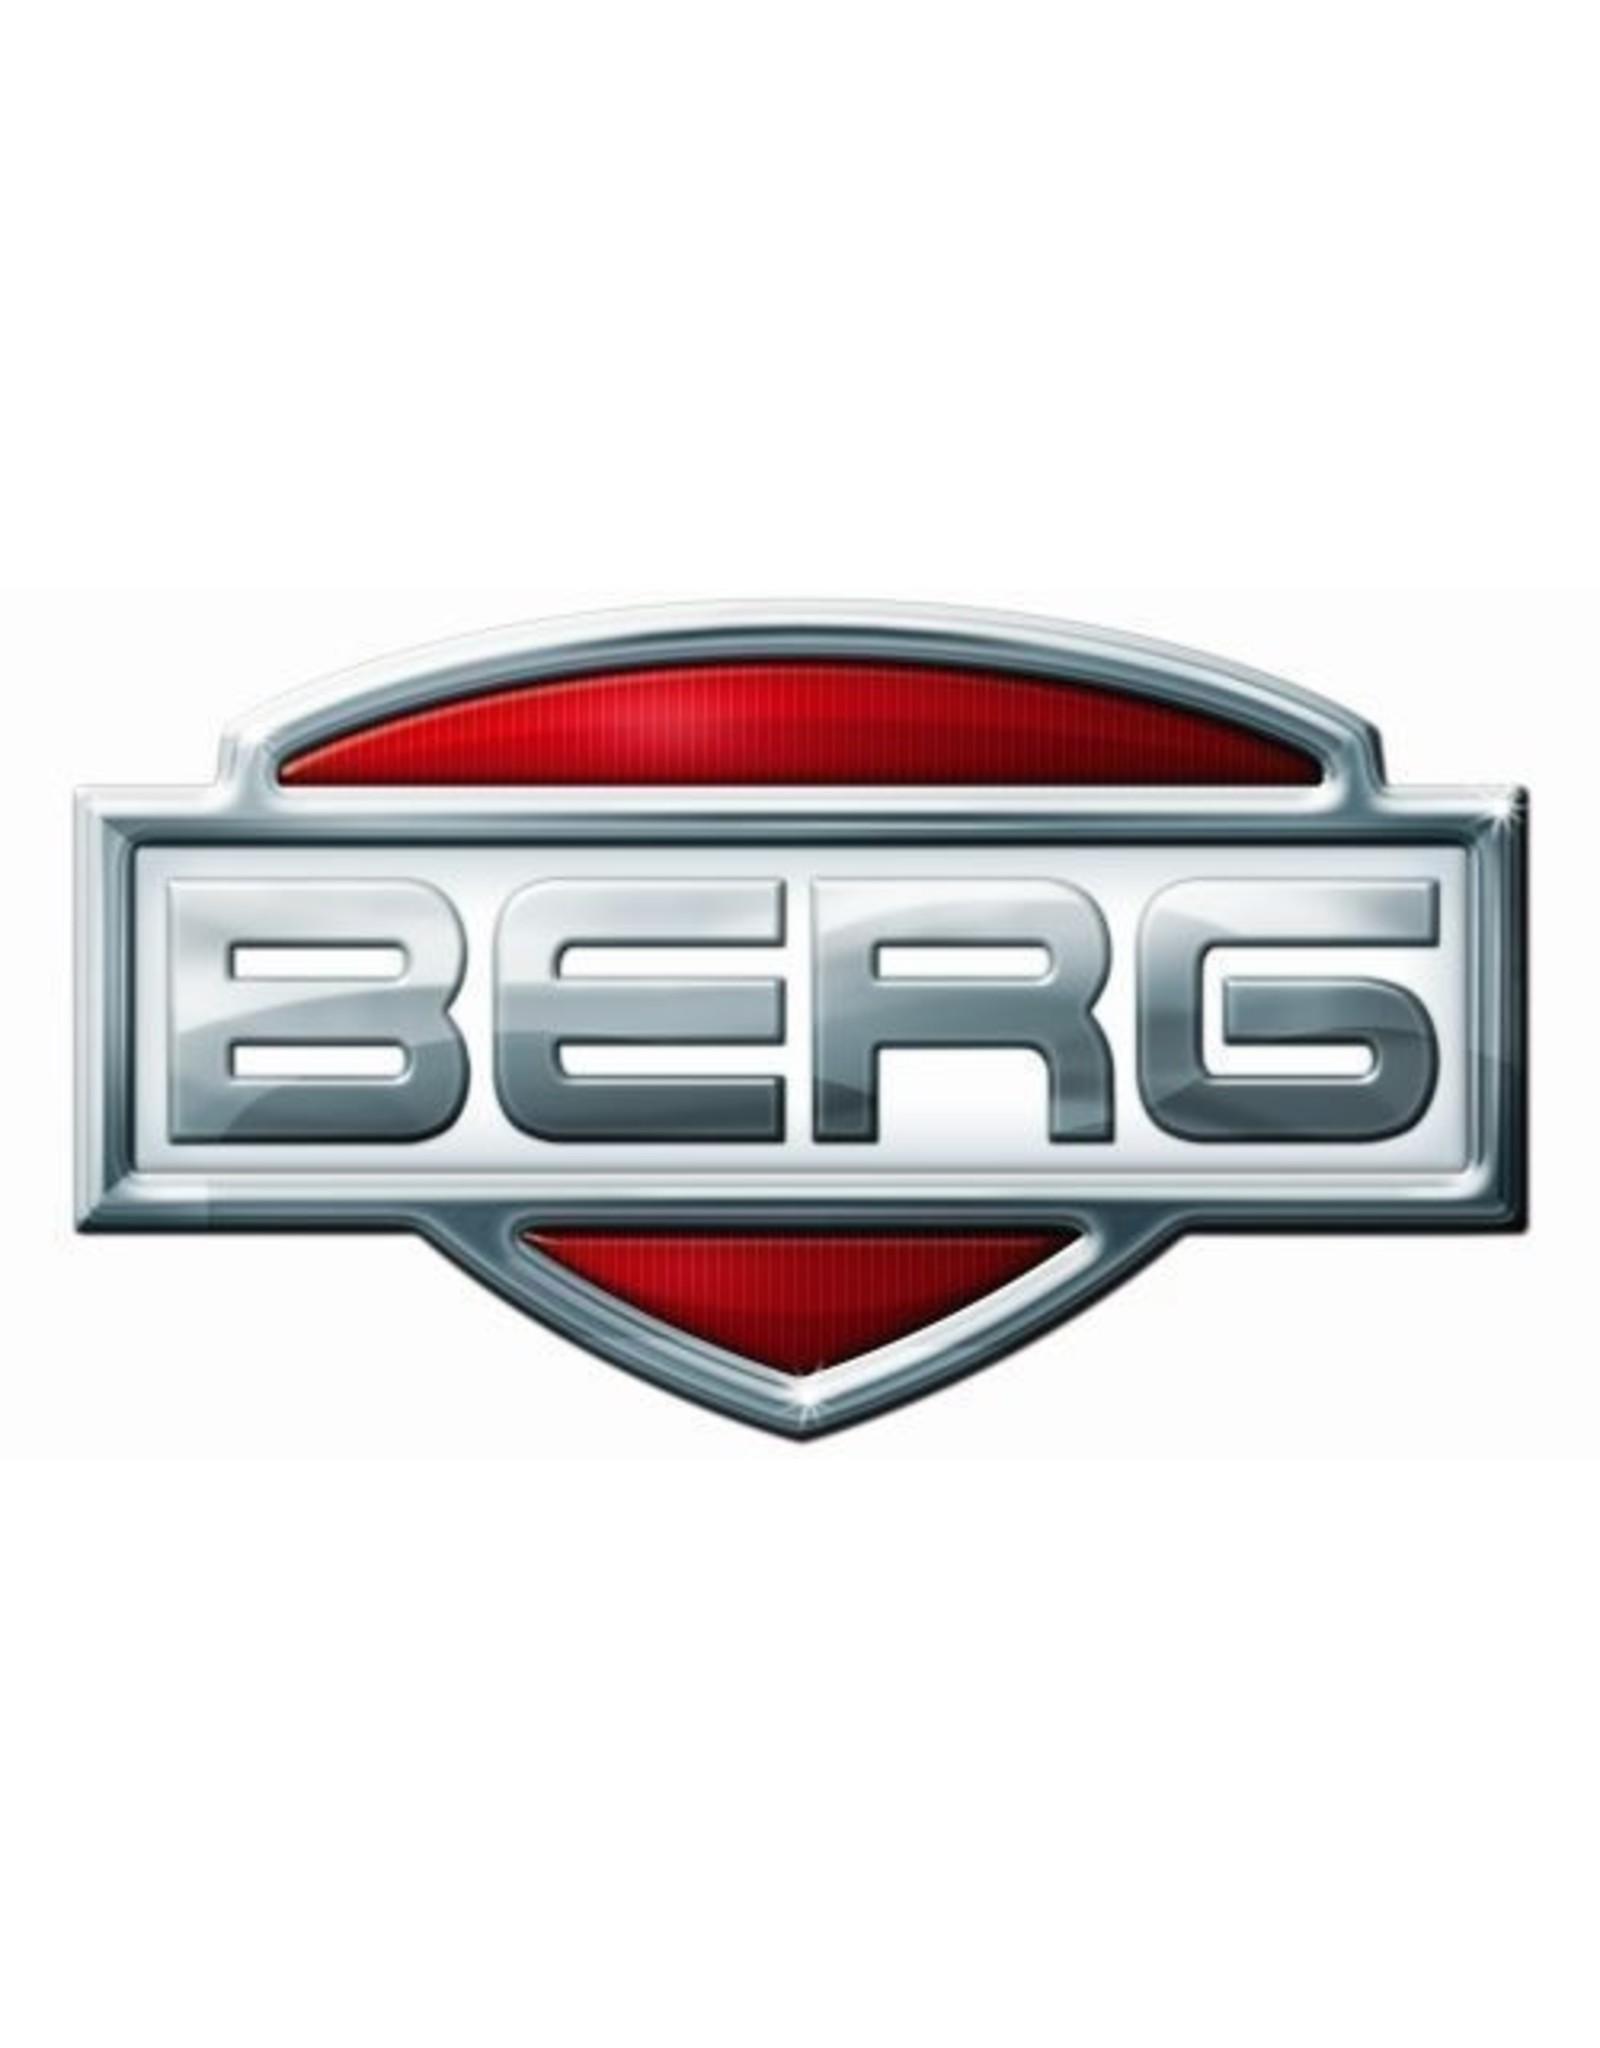 BERG BERG Reifen 12.5X3.00-9 slick